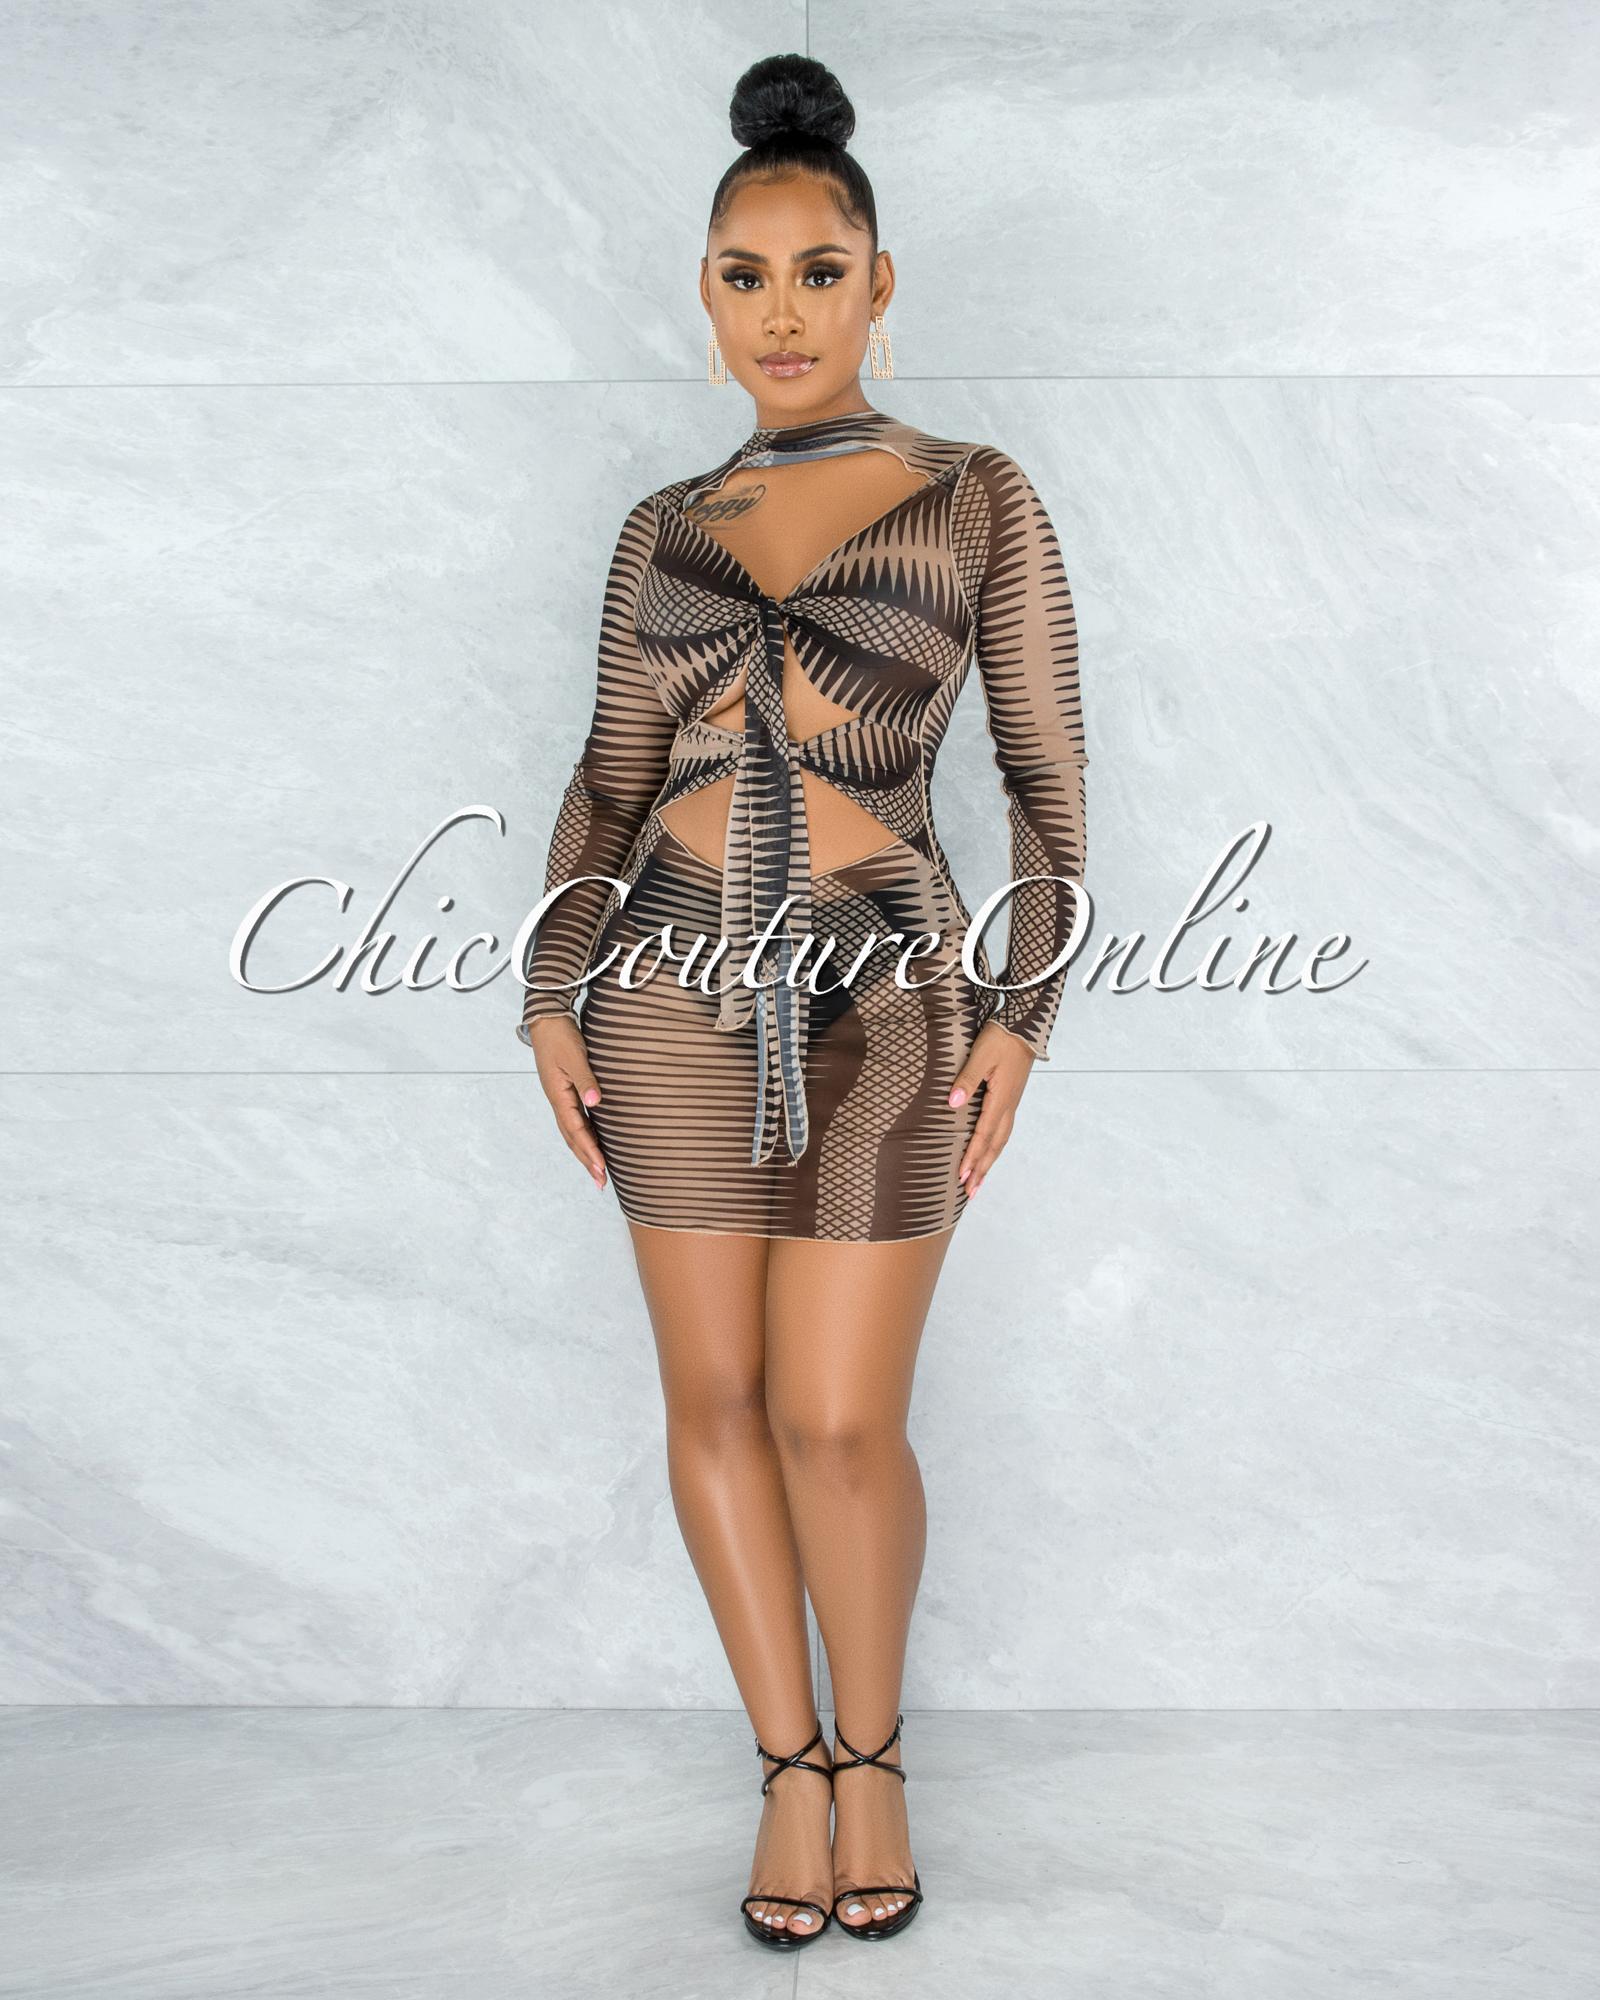 Amparo Black Nude Sheer Mesh Front Tie Straps Dress